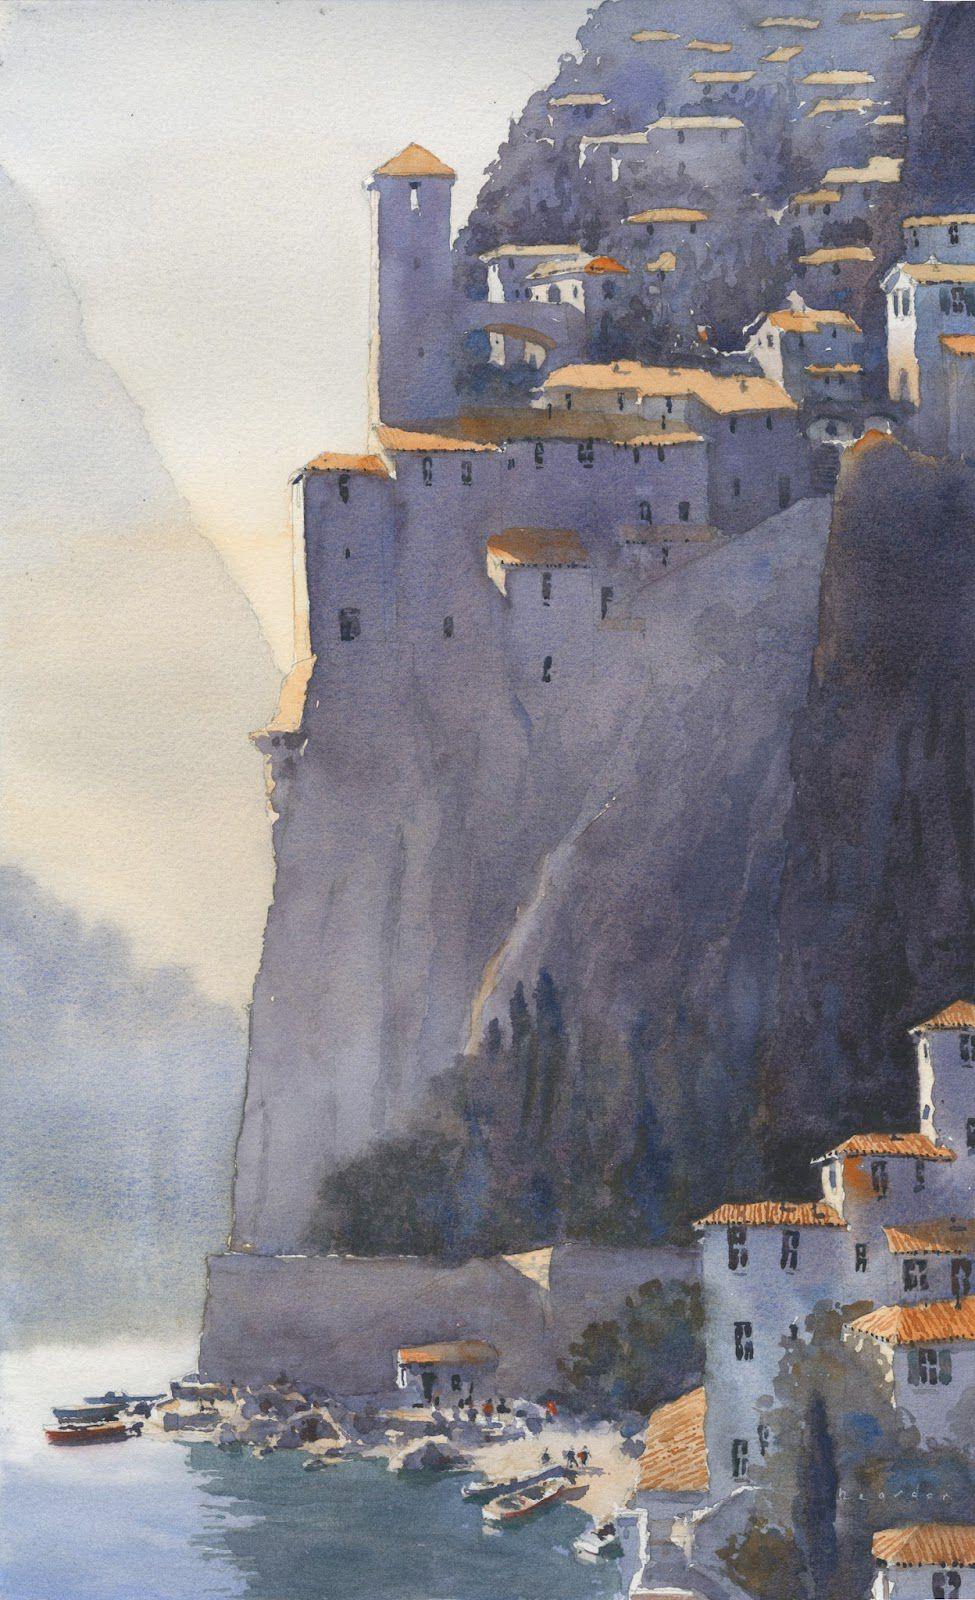 Placida by Michael Reardon, watercolor painting.